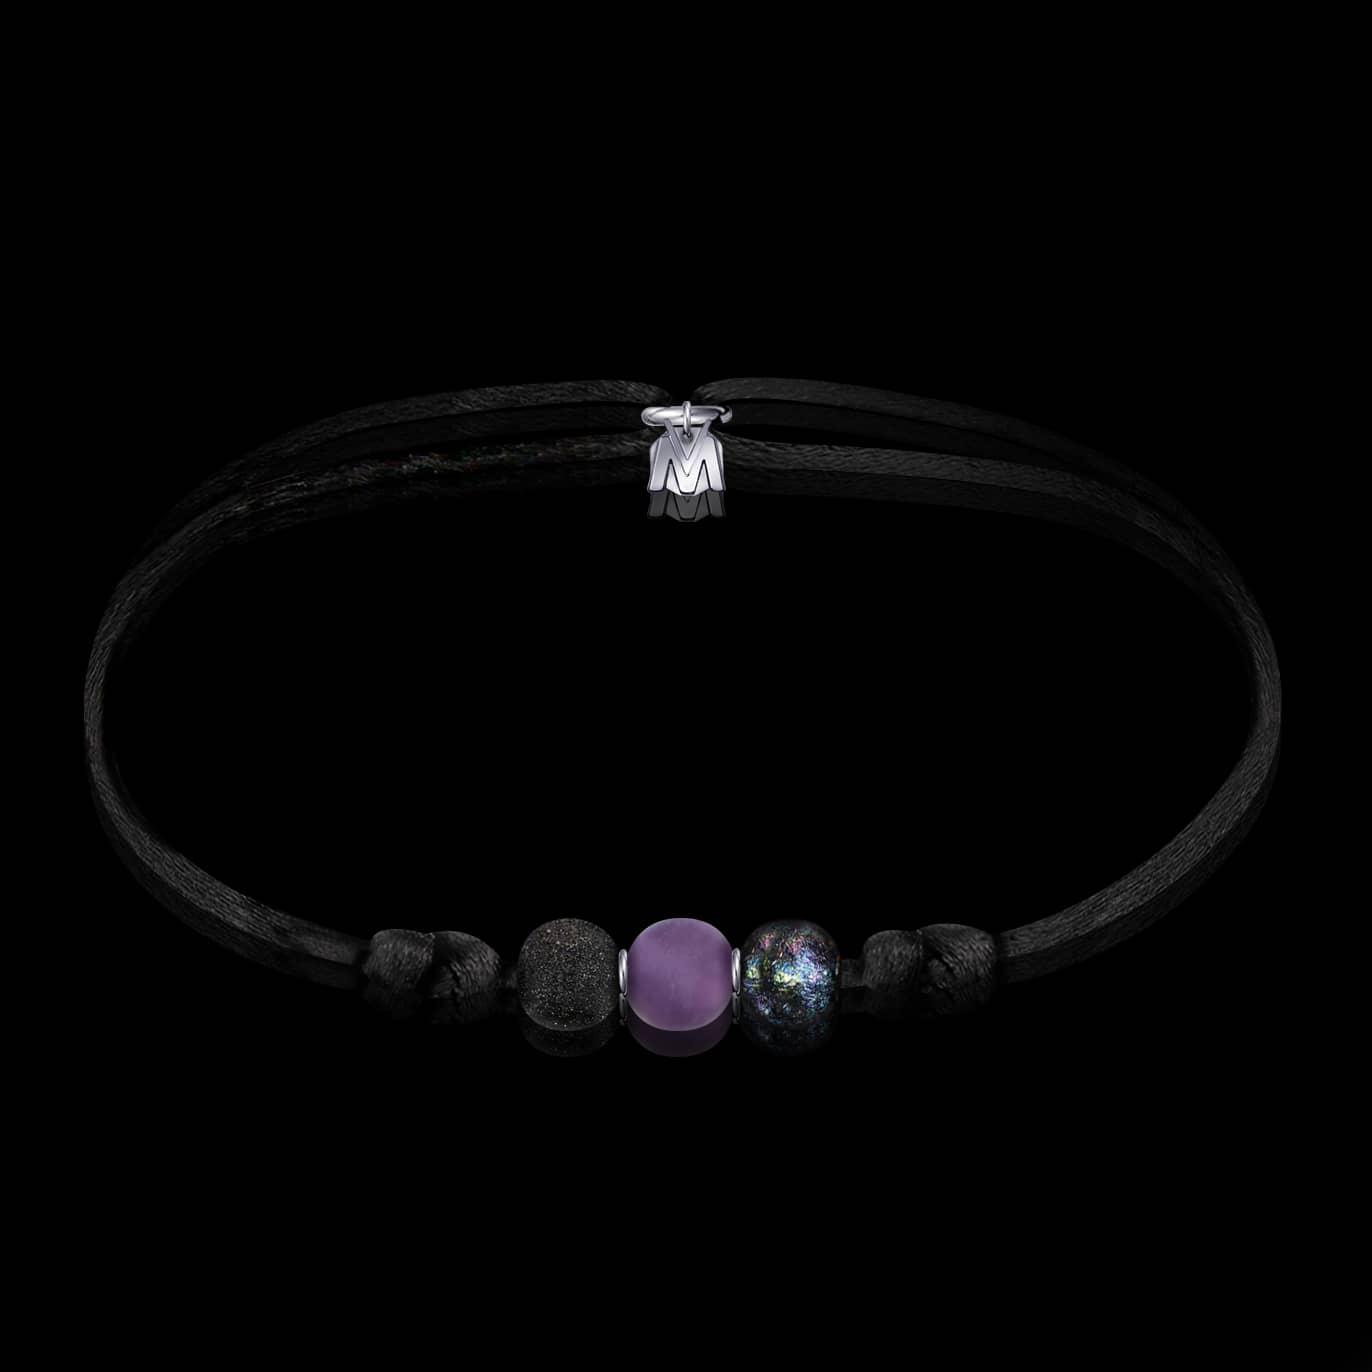 bracelet-amethyste-verre-made-in-france-sur-cordon